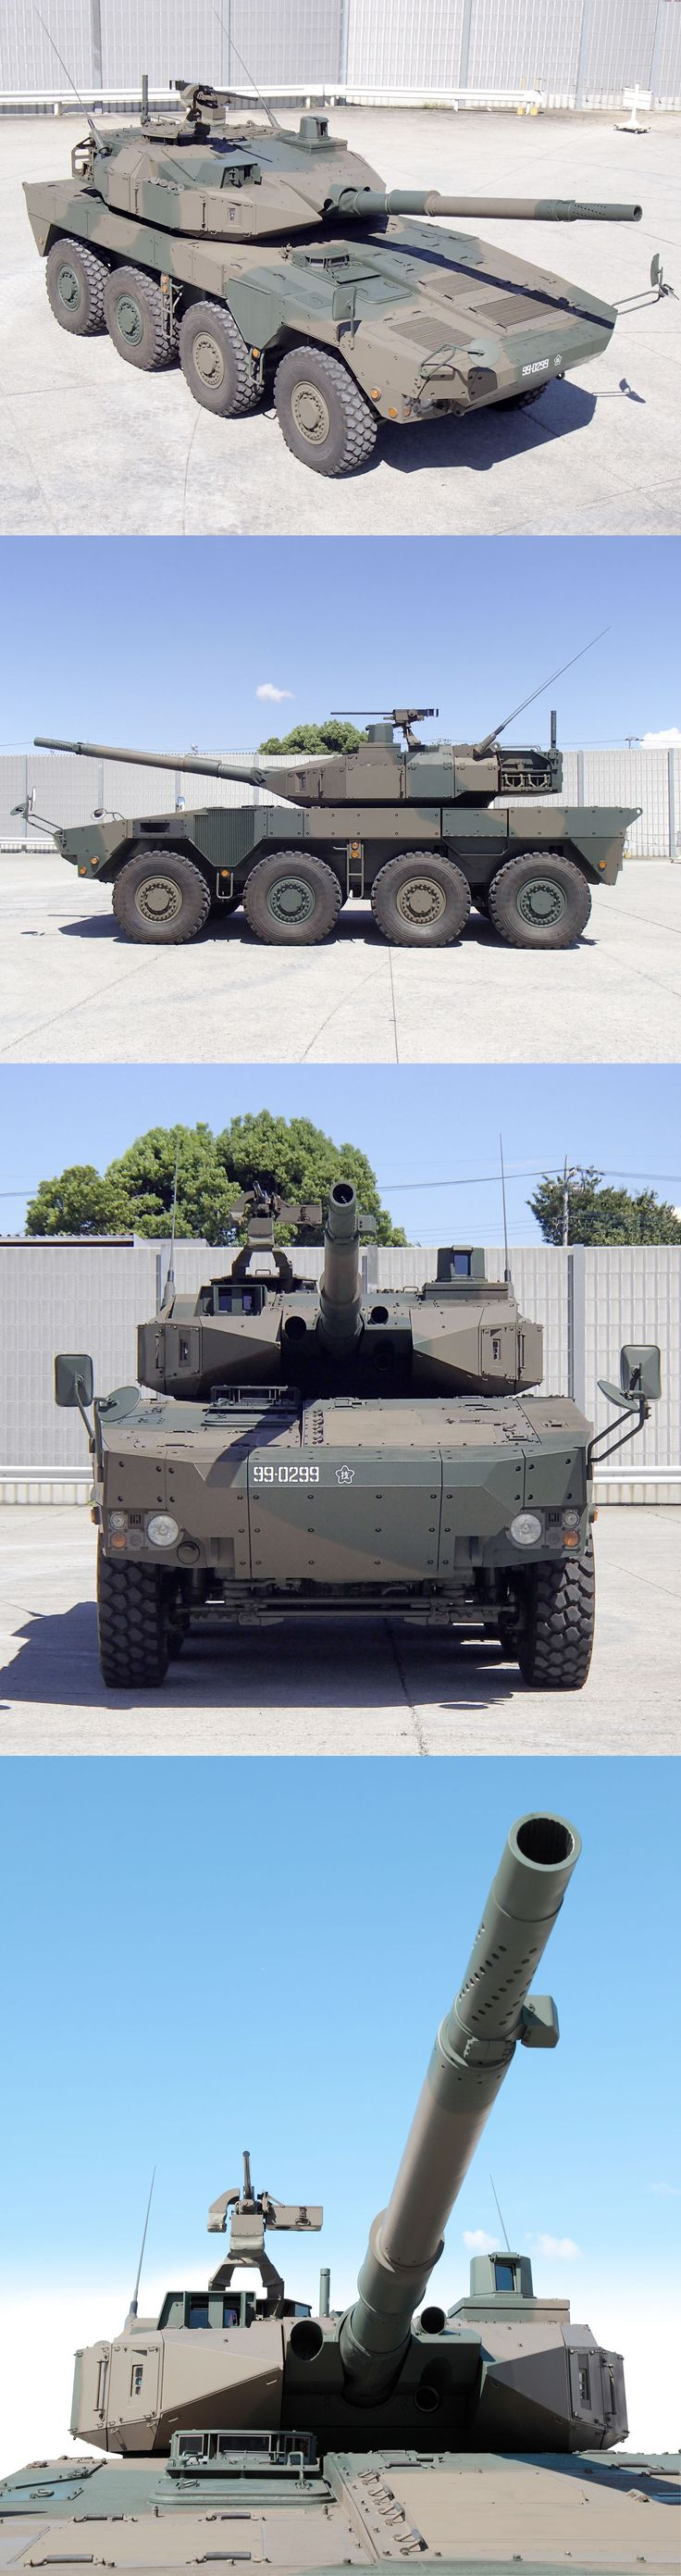 Maneuver Combat Vehicle (MCB)  The Maneuver Combat Vehicle (機動戦闘車 kidou-sentou-sha) is a wheeled tank destroyer of the Japan Ground Self-Defense Force.